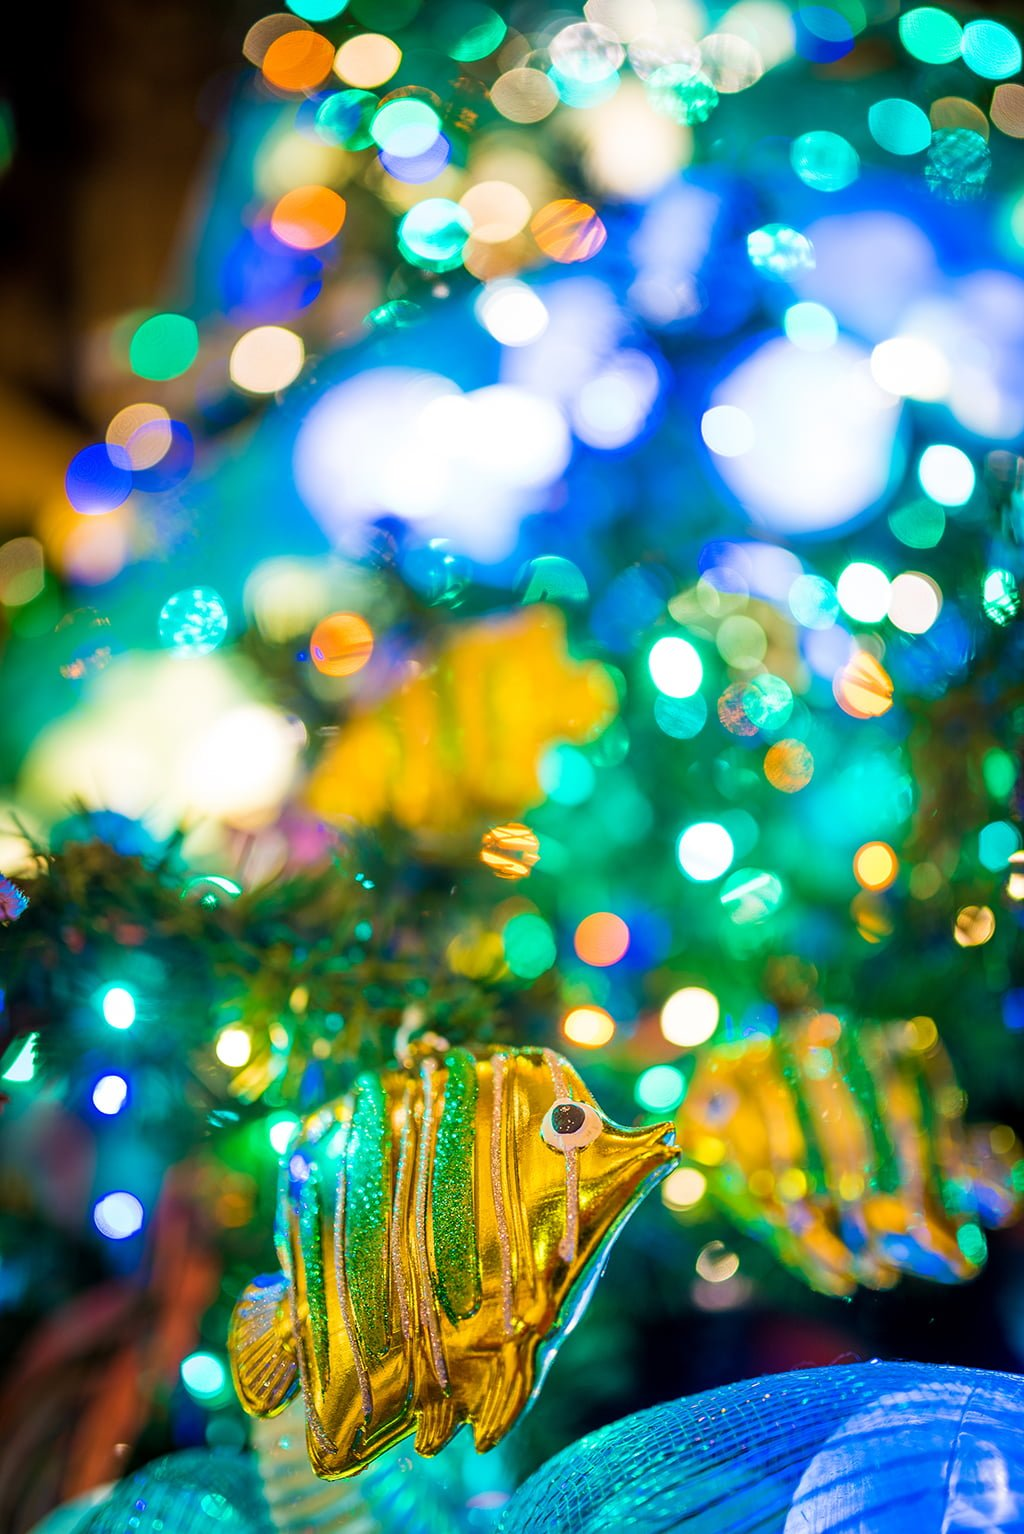 disneyland hotels christmas decorations 029 - Disneyland Christmas Decorations